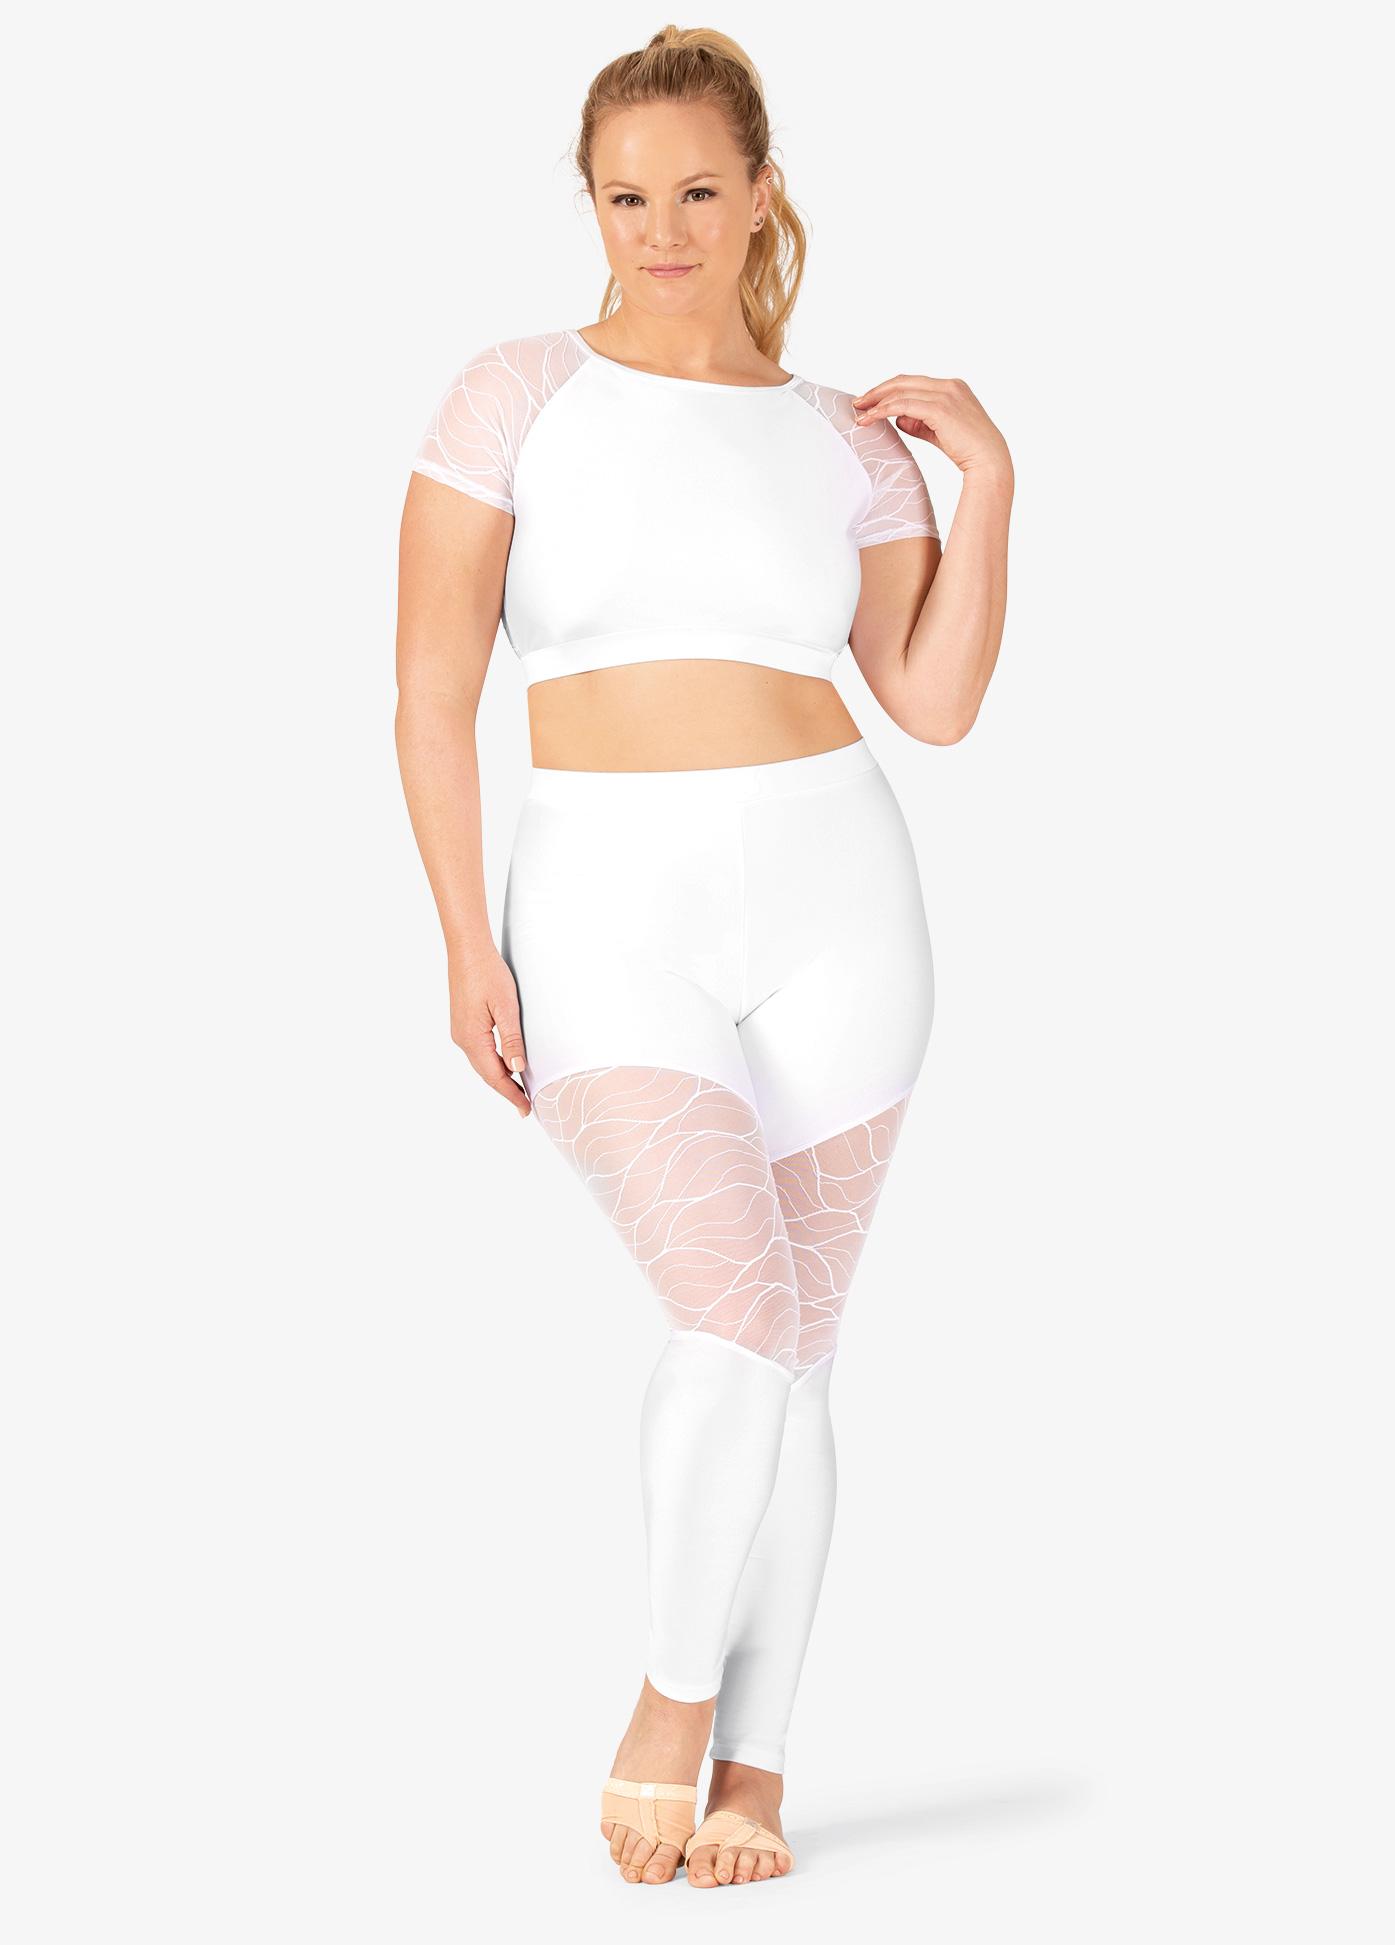 Double Platinum Womens Plus Size Swirl Mesh Ankle Dance Leggings N7634P